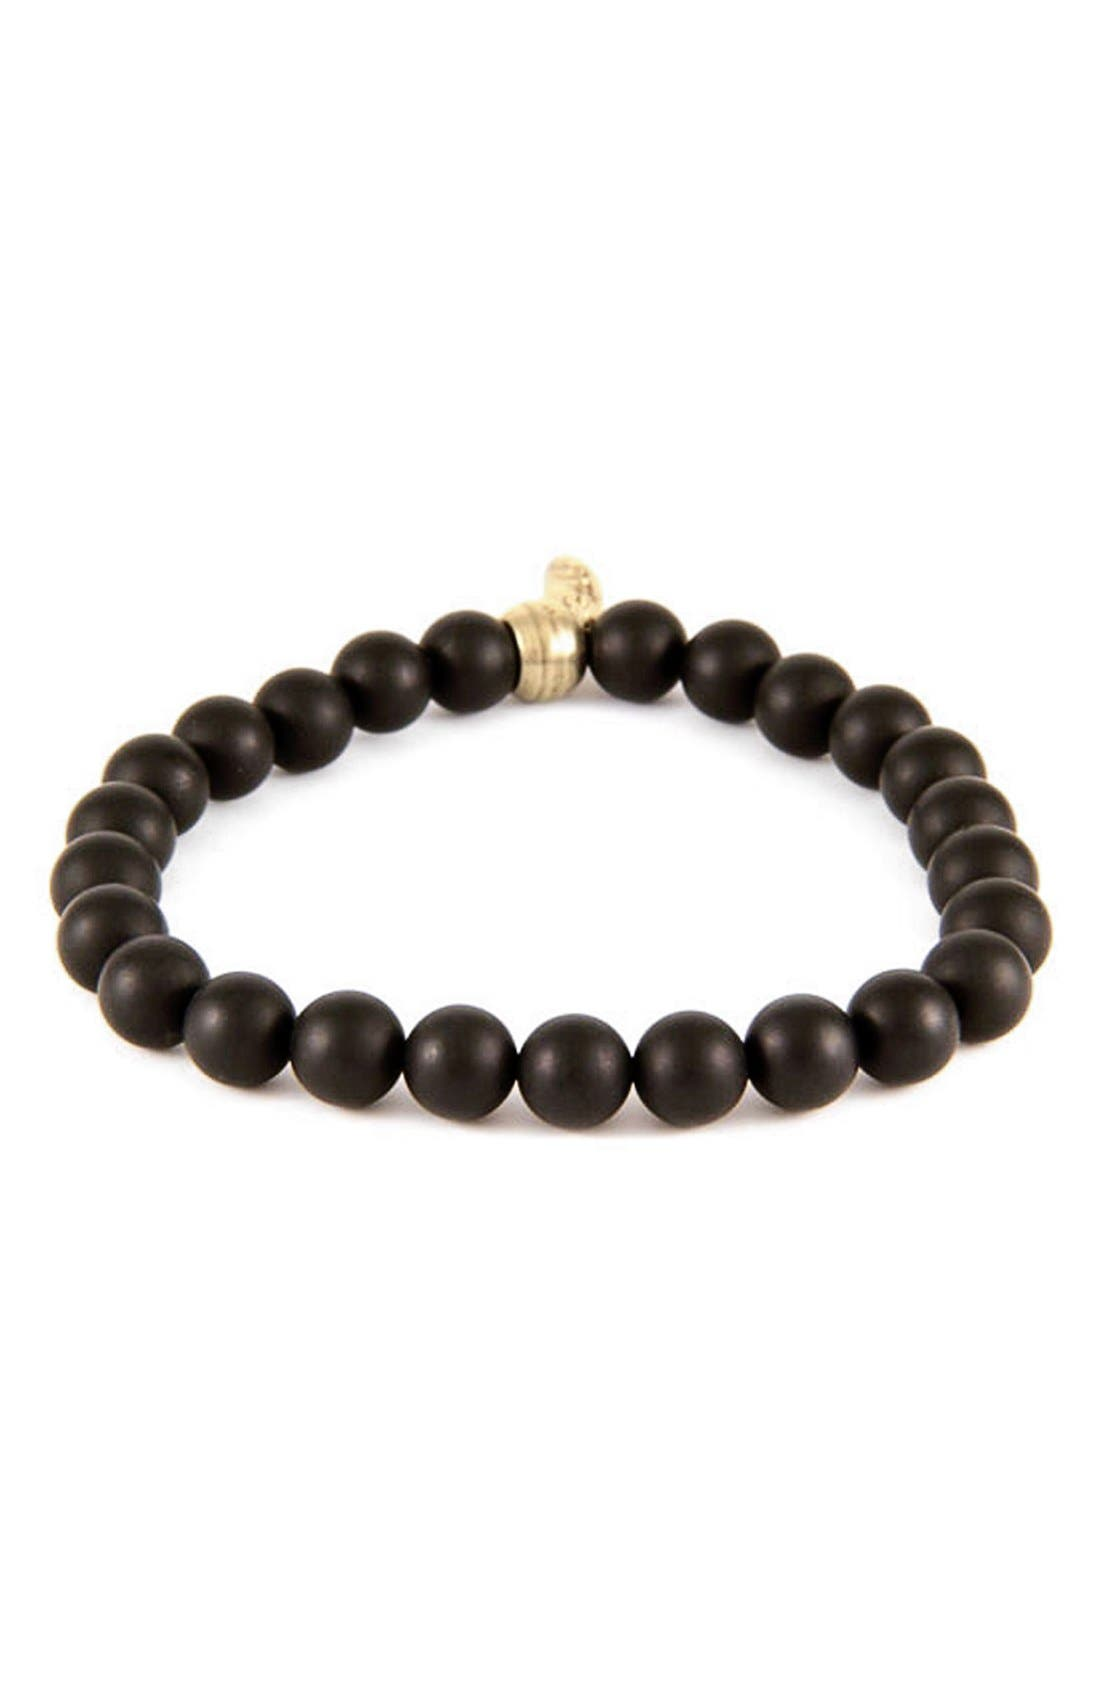 Main Image - Mr. Ettika Agate Bead Bracelet